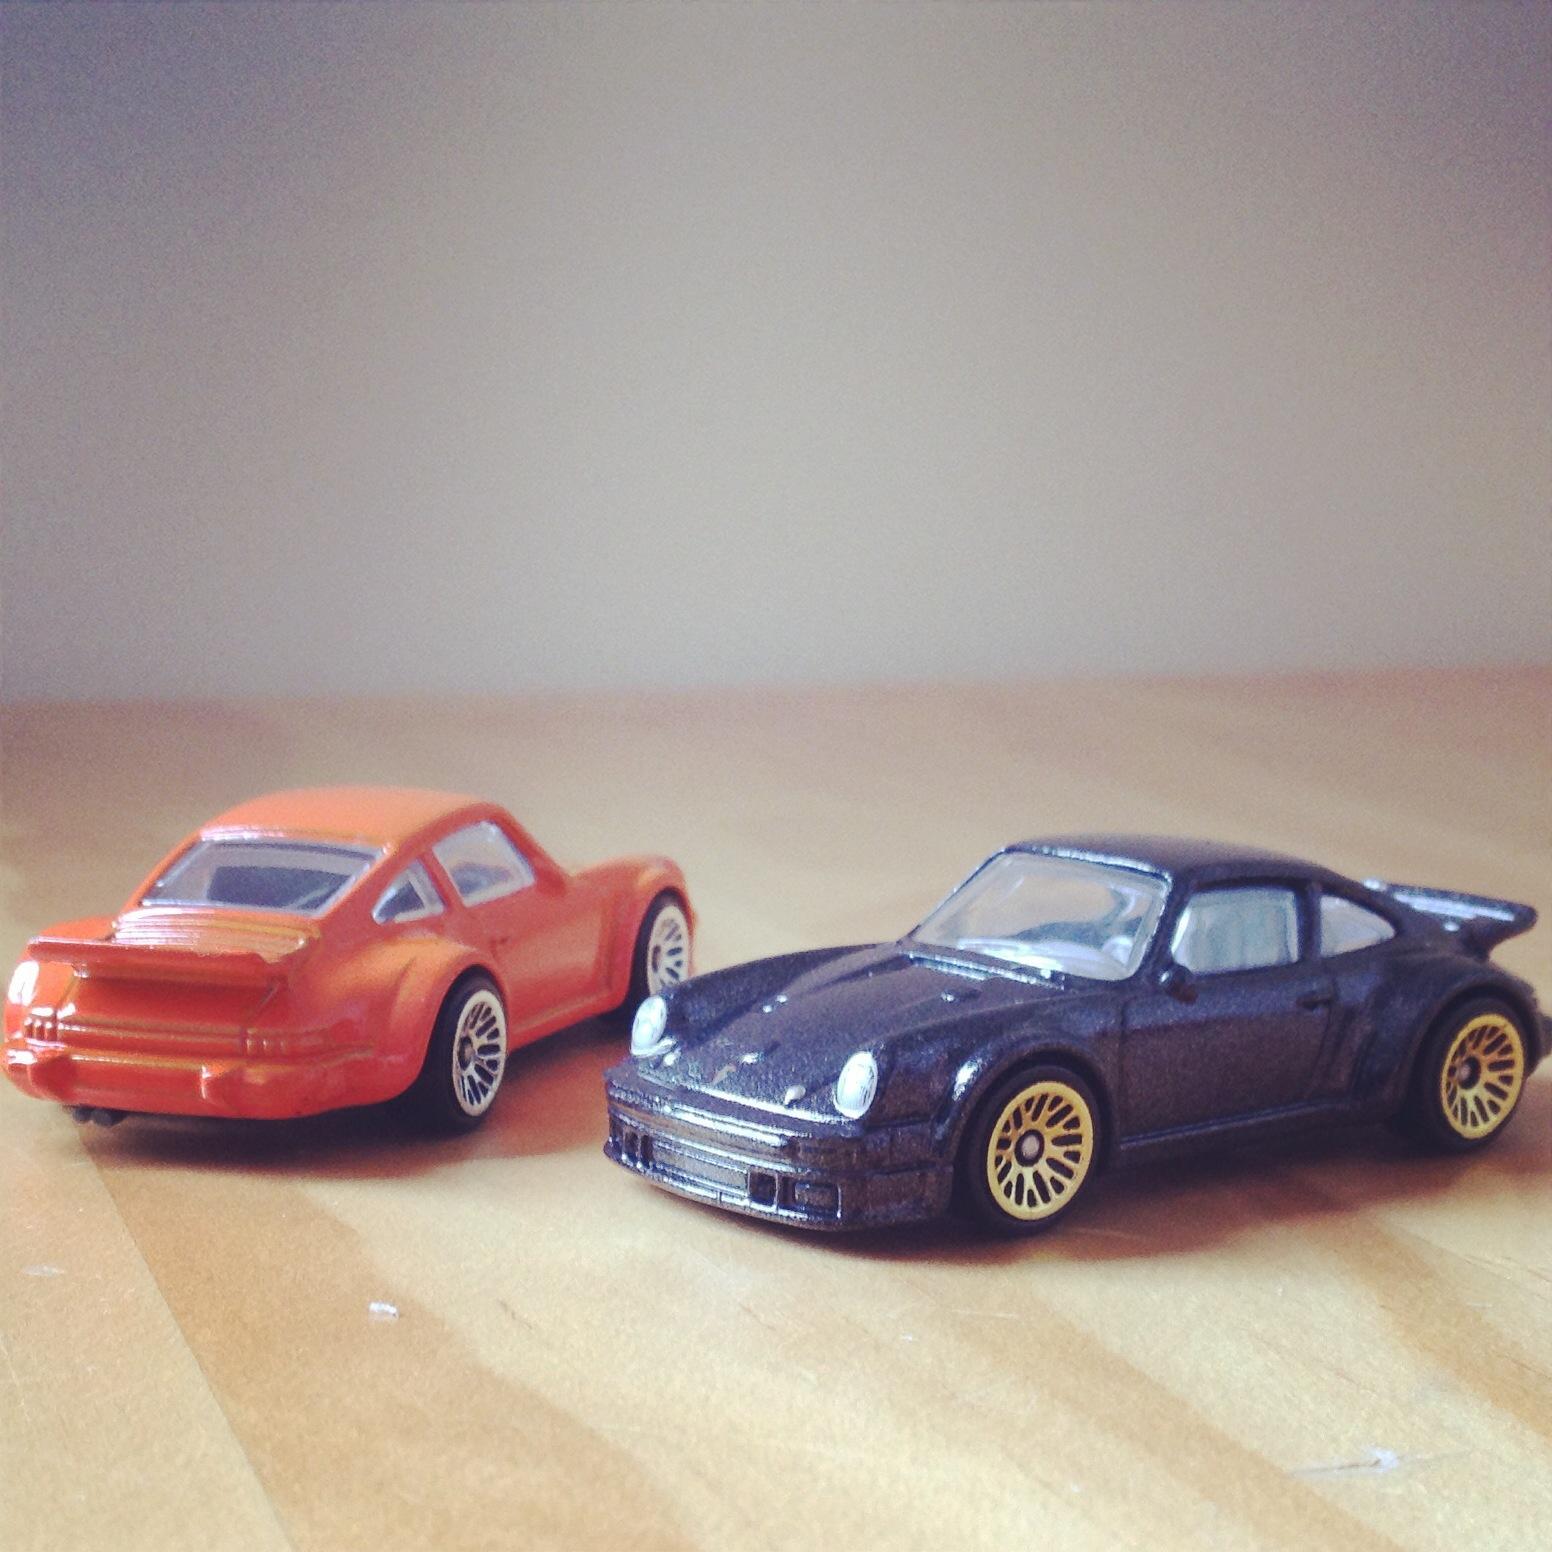 img_3653 Outstanding Porsche 911 Gt2 Hot Wheels Cars Trend